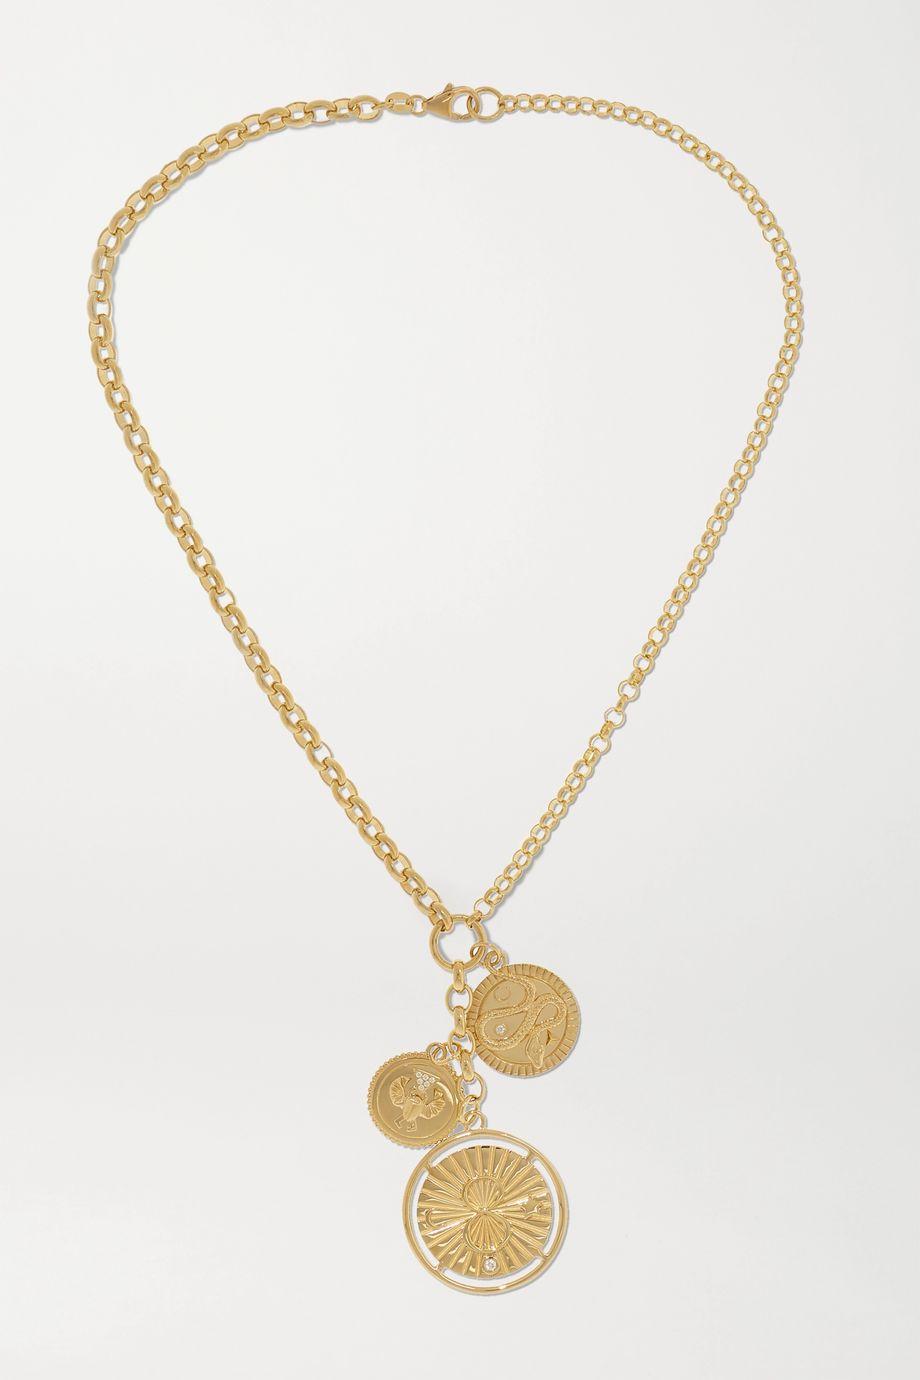 Foundrae Karma, Protection and Wholeness 18-karat gold diamond necklace